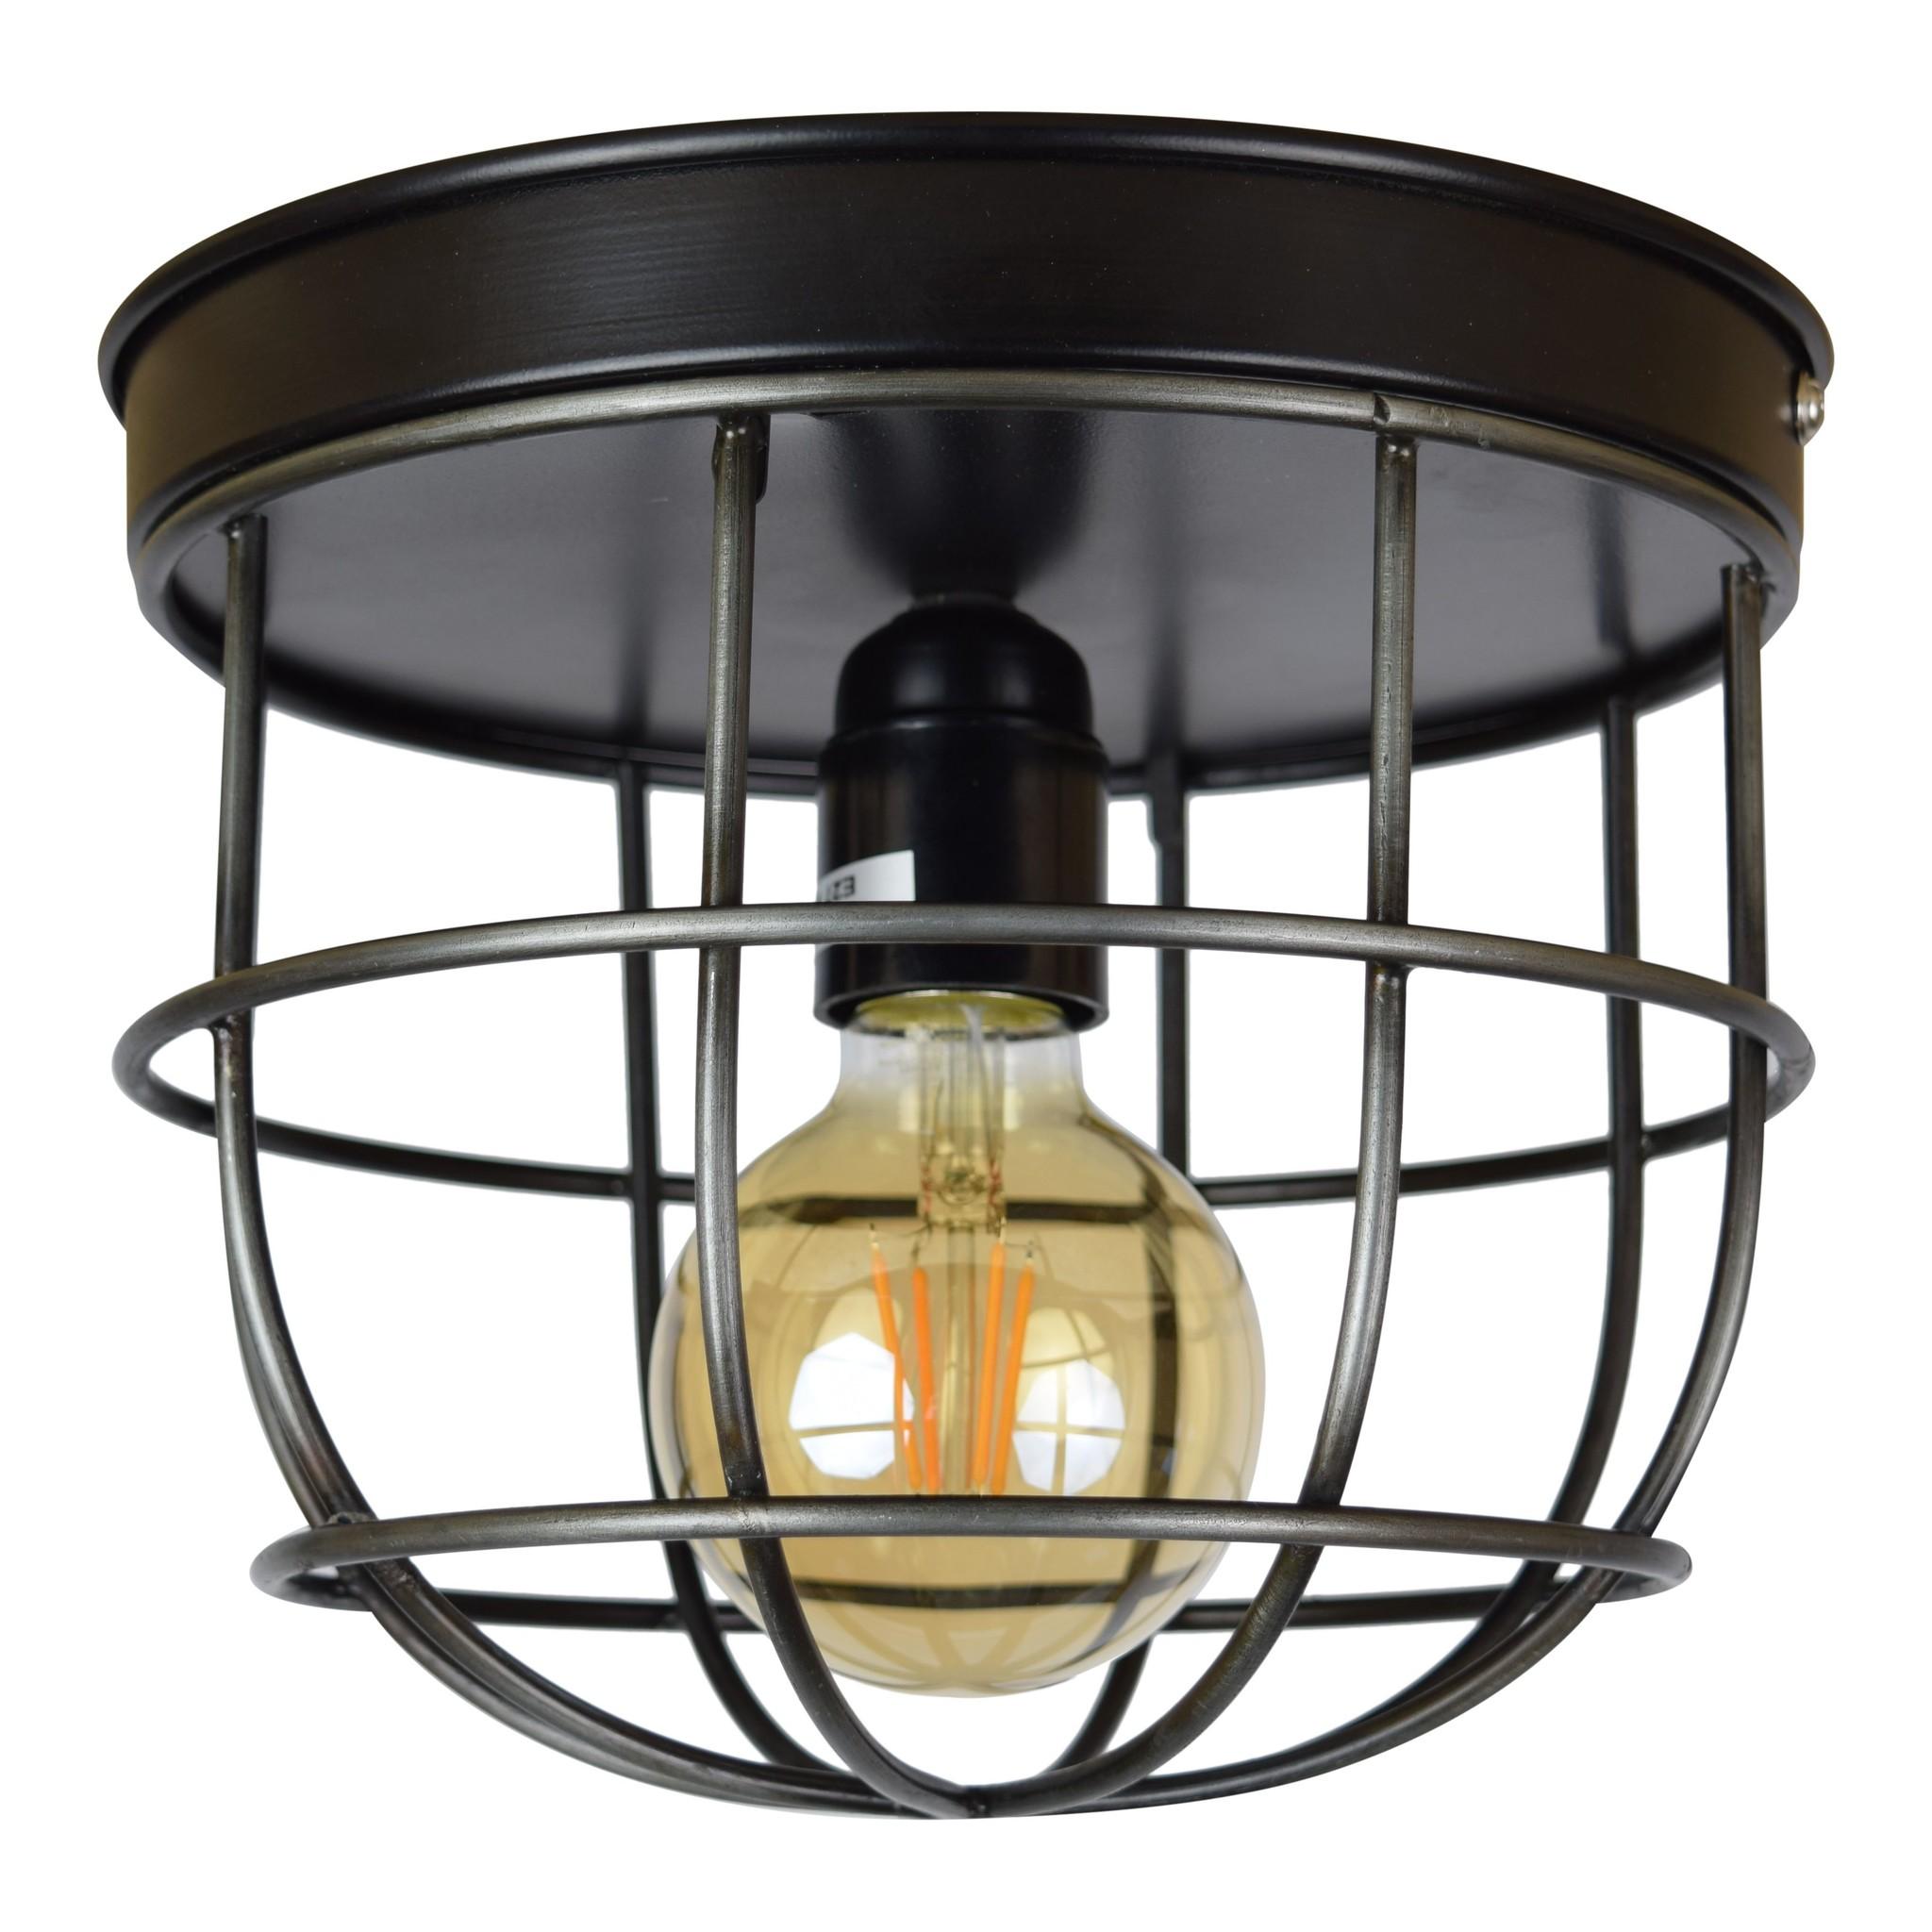 Urban Interiors Plafondlamp Barn Large Ø 22 cm zwart